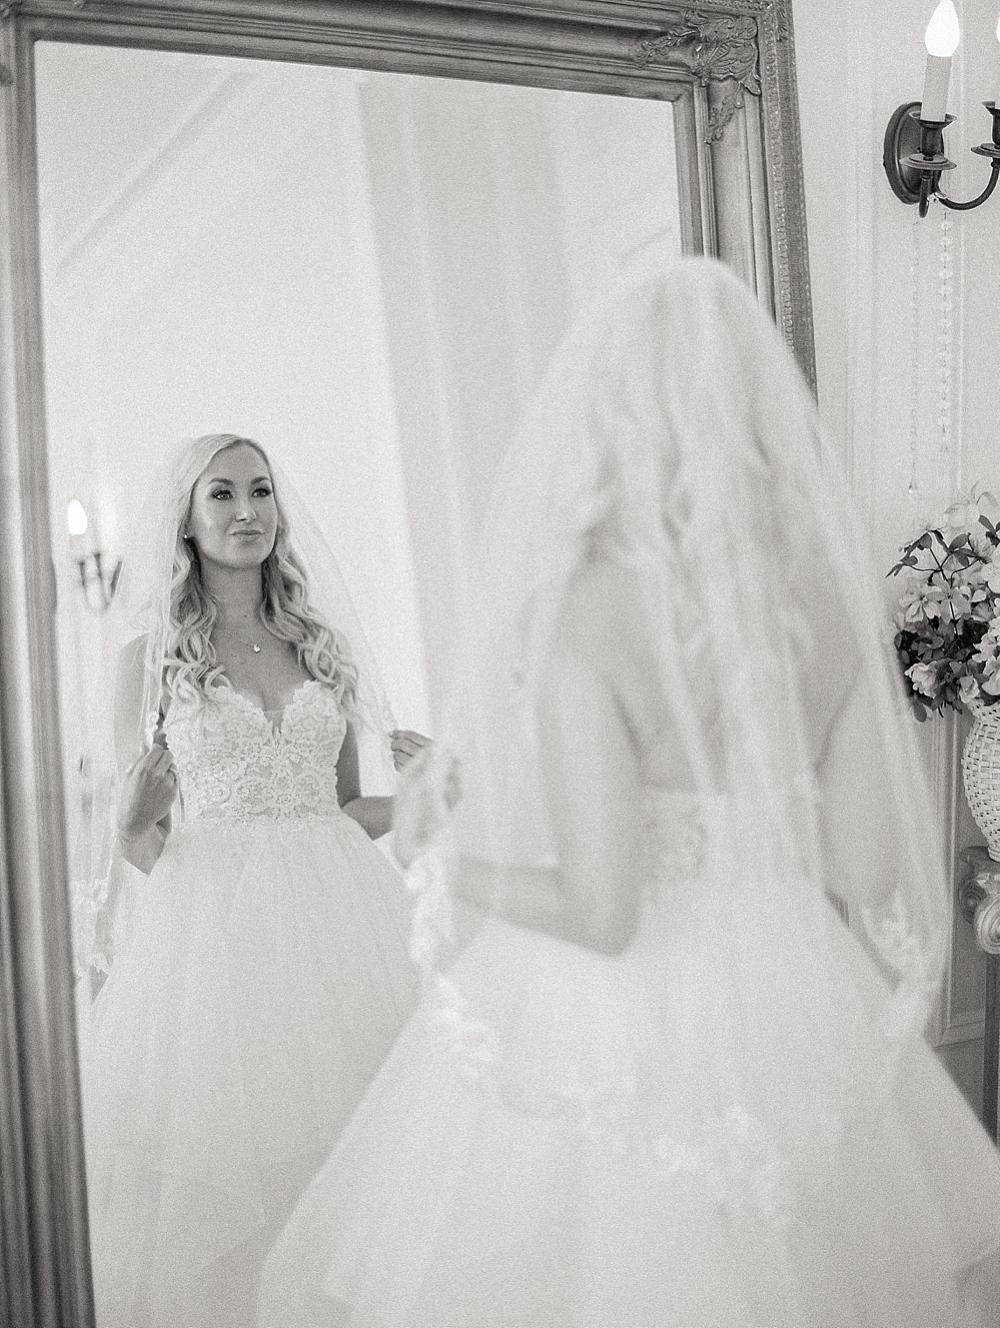 kristin-la-voie-photography-lehmann-mansion-wedding-photographer-179